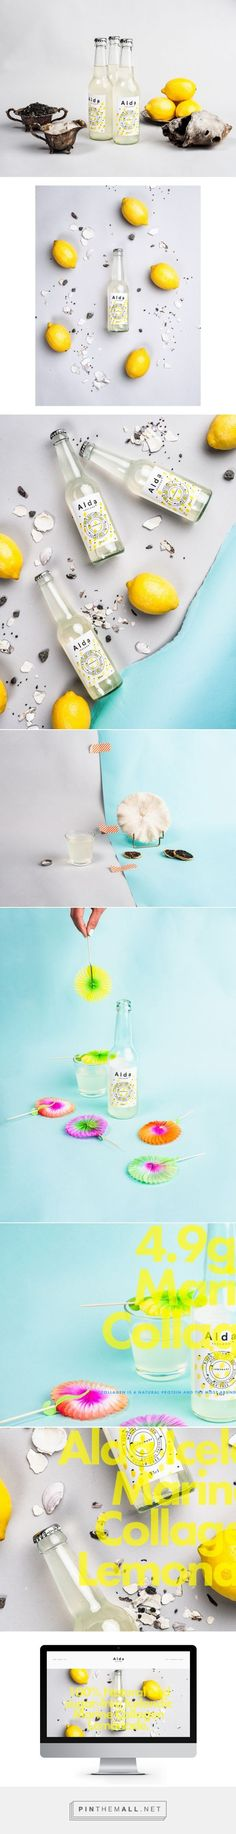 Alda Iceland Lemonade Packaging by Milja Emilia | Fivestar Branding Agency – Design and Branding Agency & Curated Inspiration Gallery